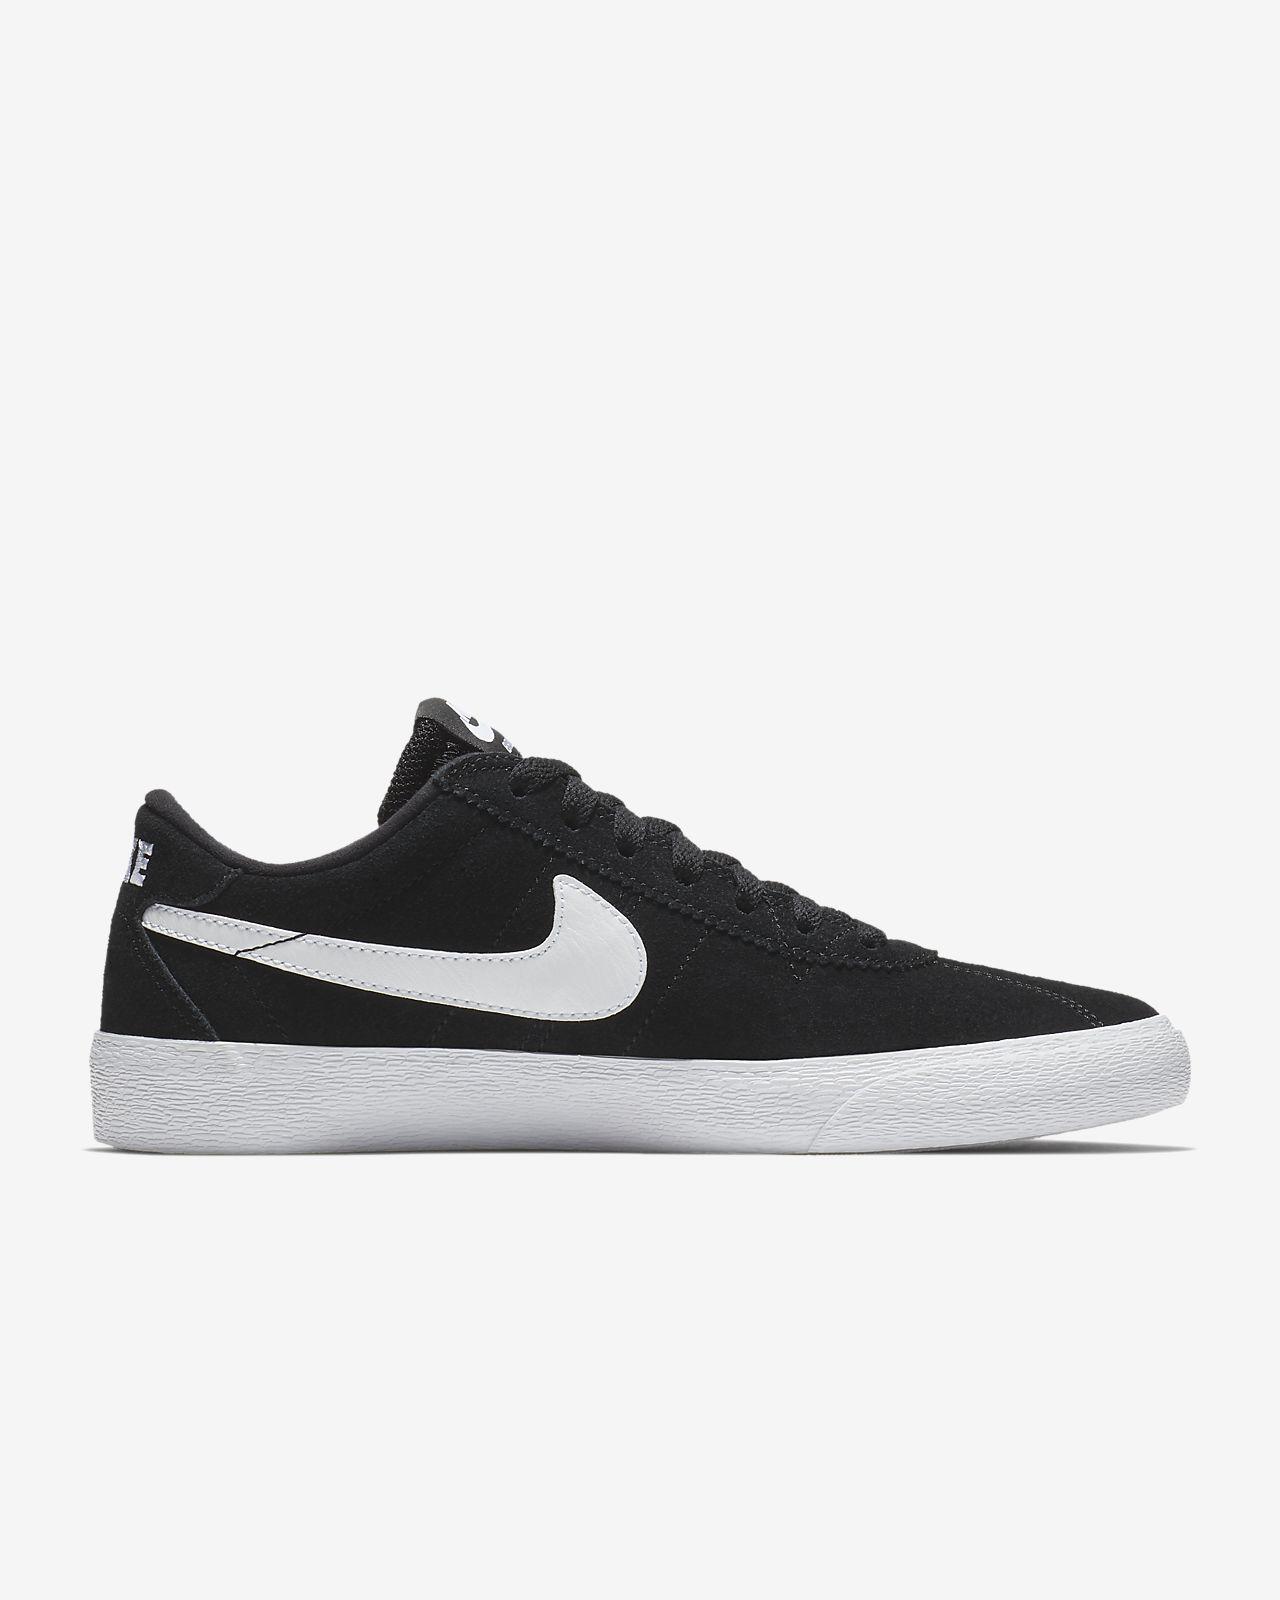 bd5d81573df7a Nike SB Zoom Bruin Low Women s Skateboarding Shoe. Nike.com AU